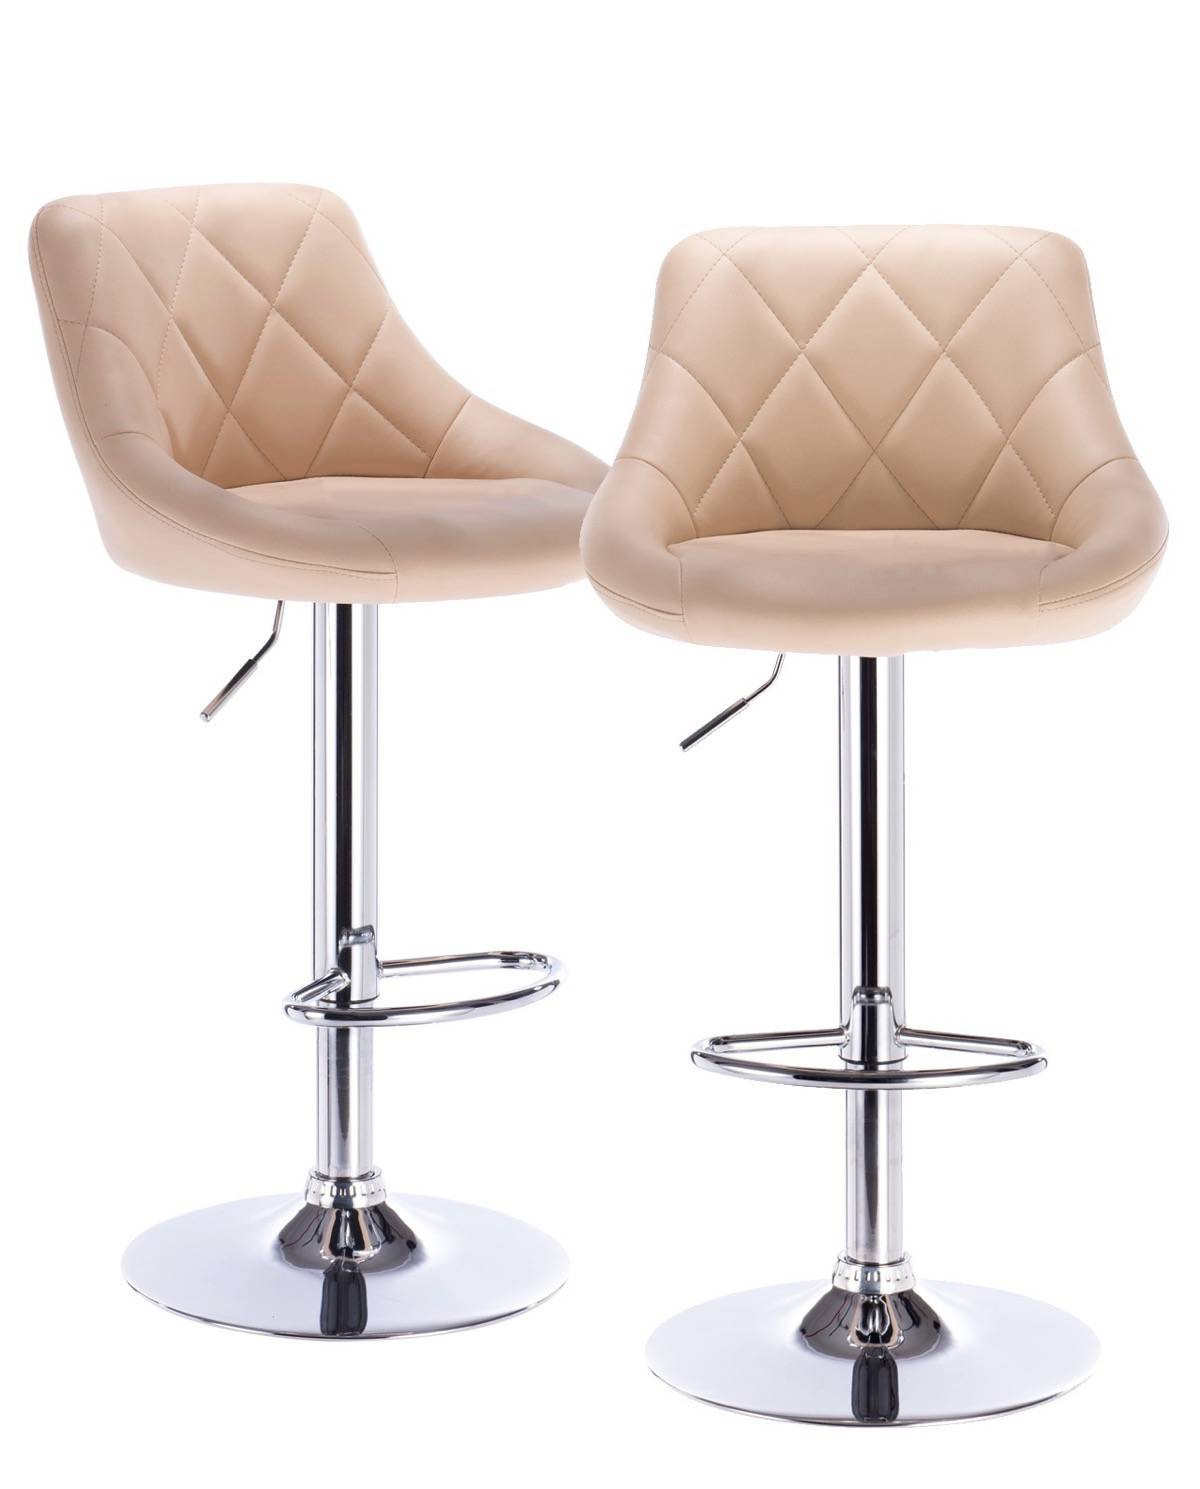 luti lot de 2 tabourets de bar matelass confort. Black Bedroom Furniture Sets. Home Design Ideas